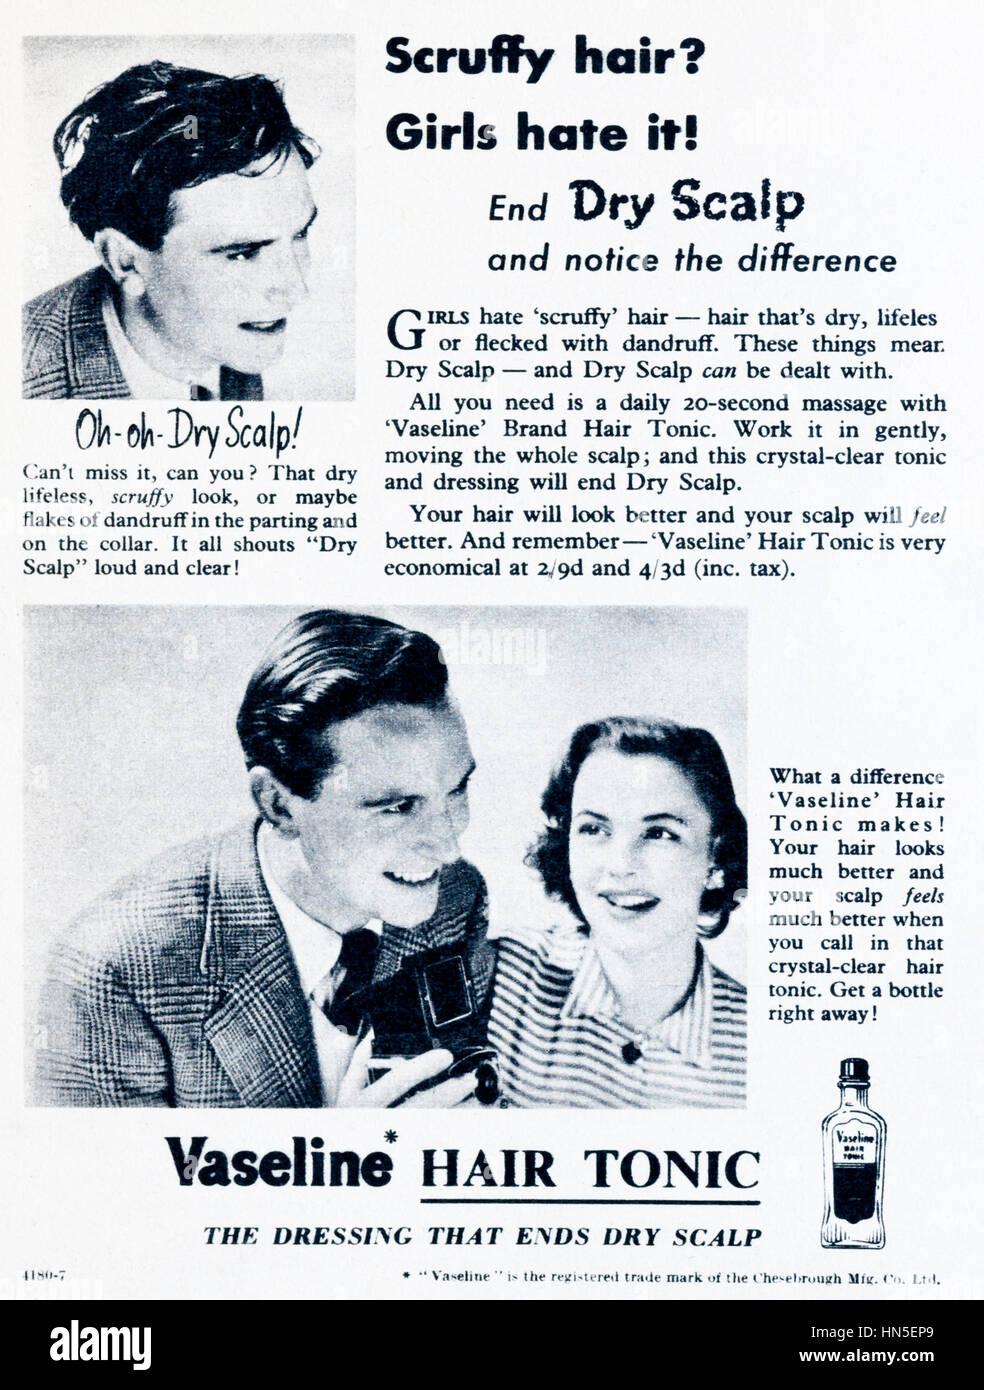 1950s magazine advert for Vaseline Hair Tonic. - Stock Image